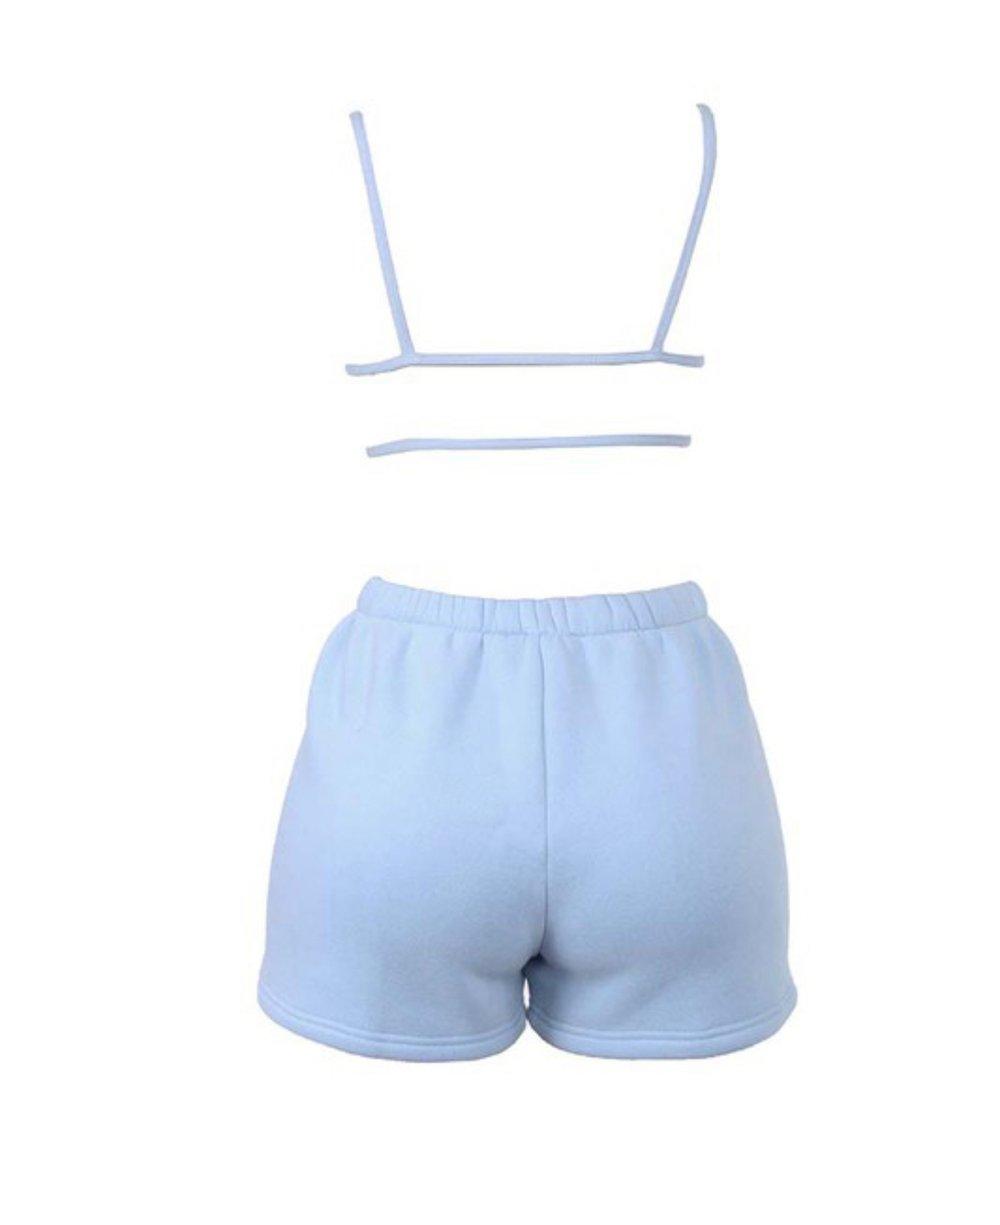 Image of Baby Blue Jogger | Short Set